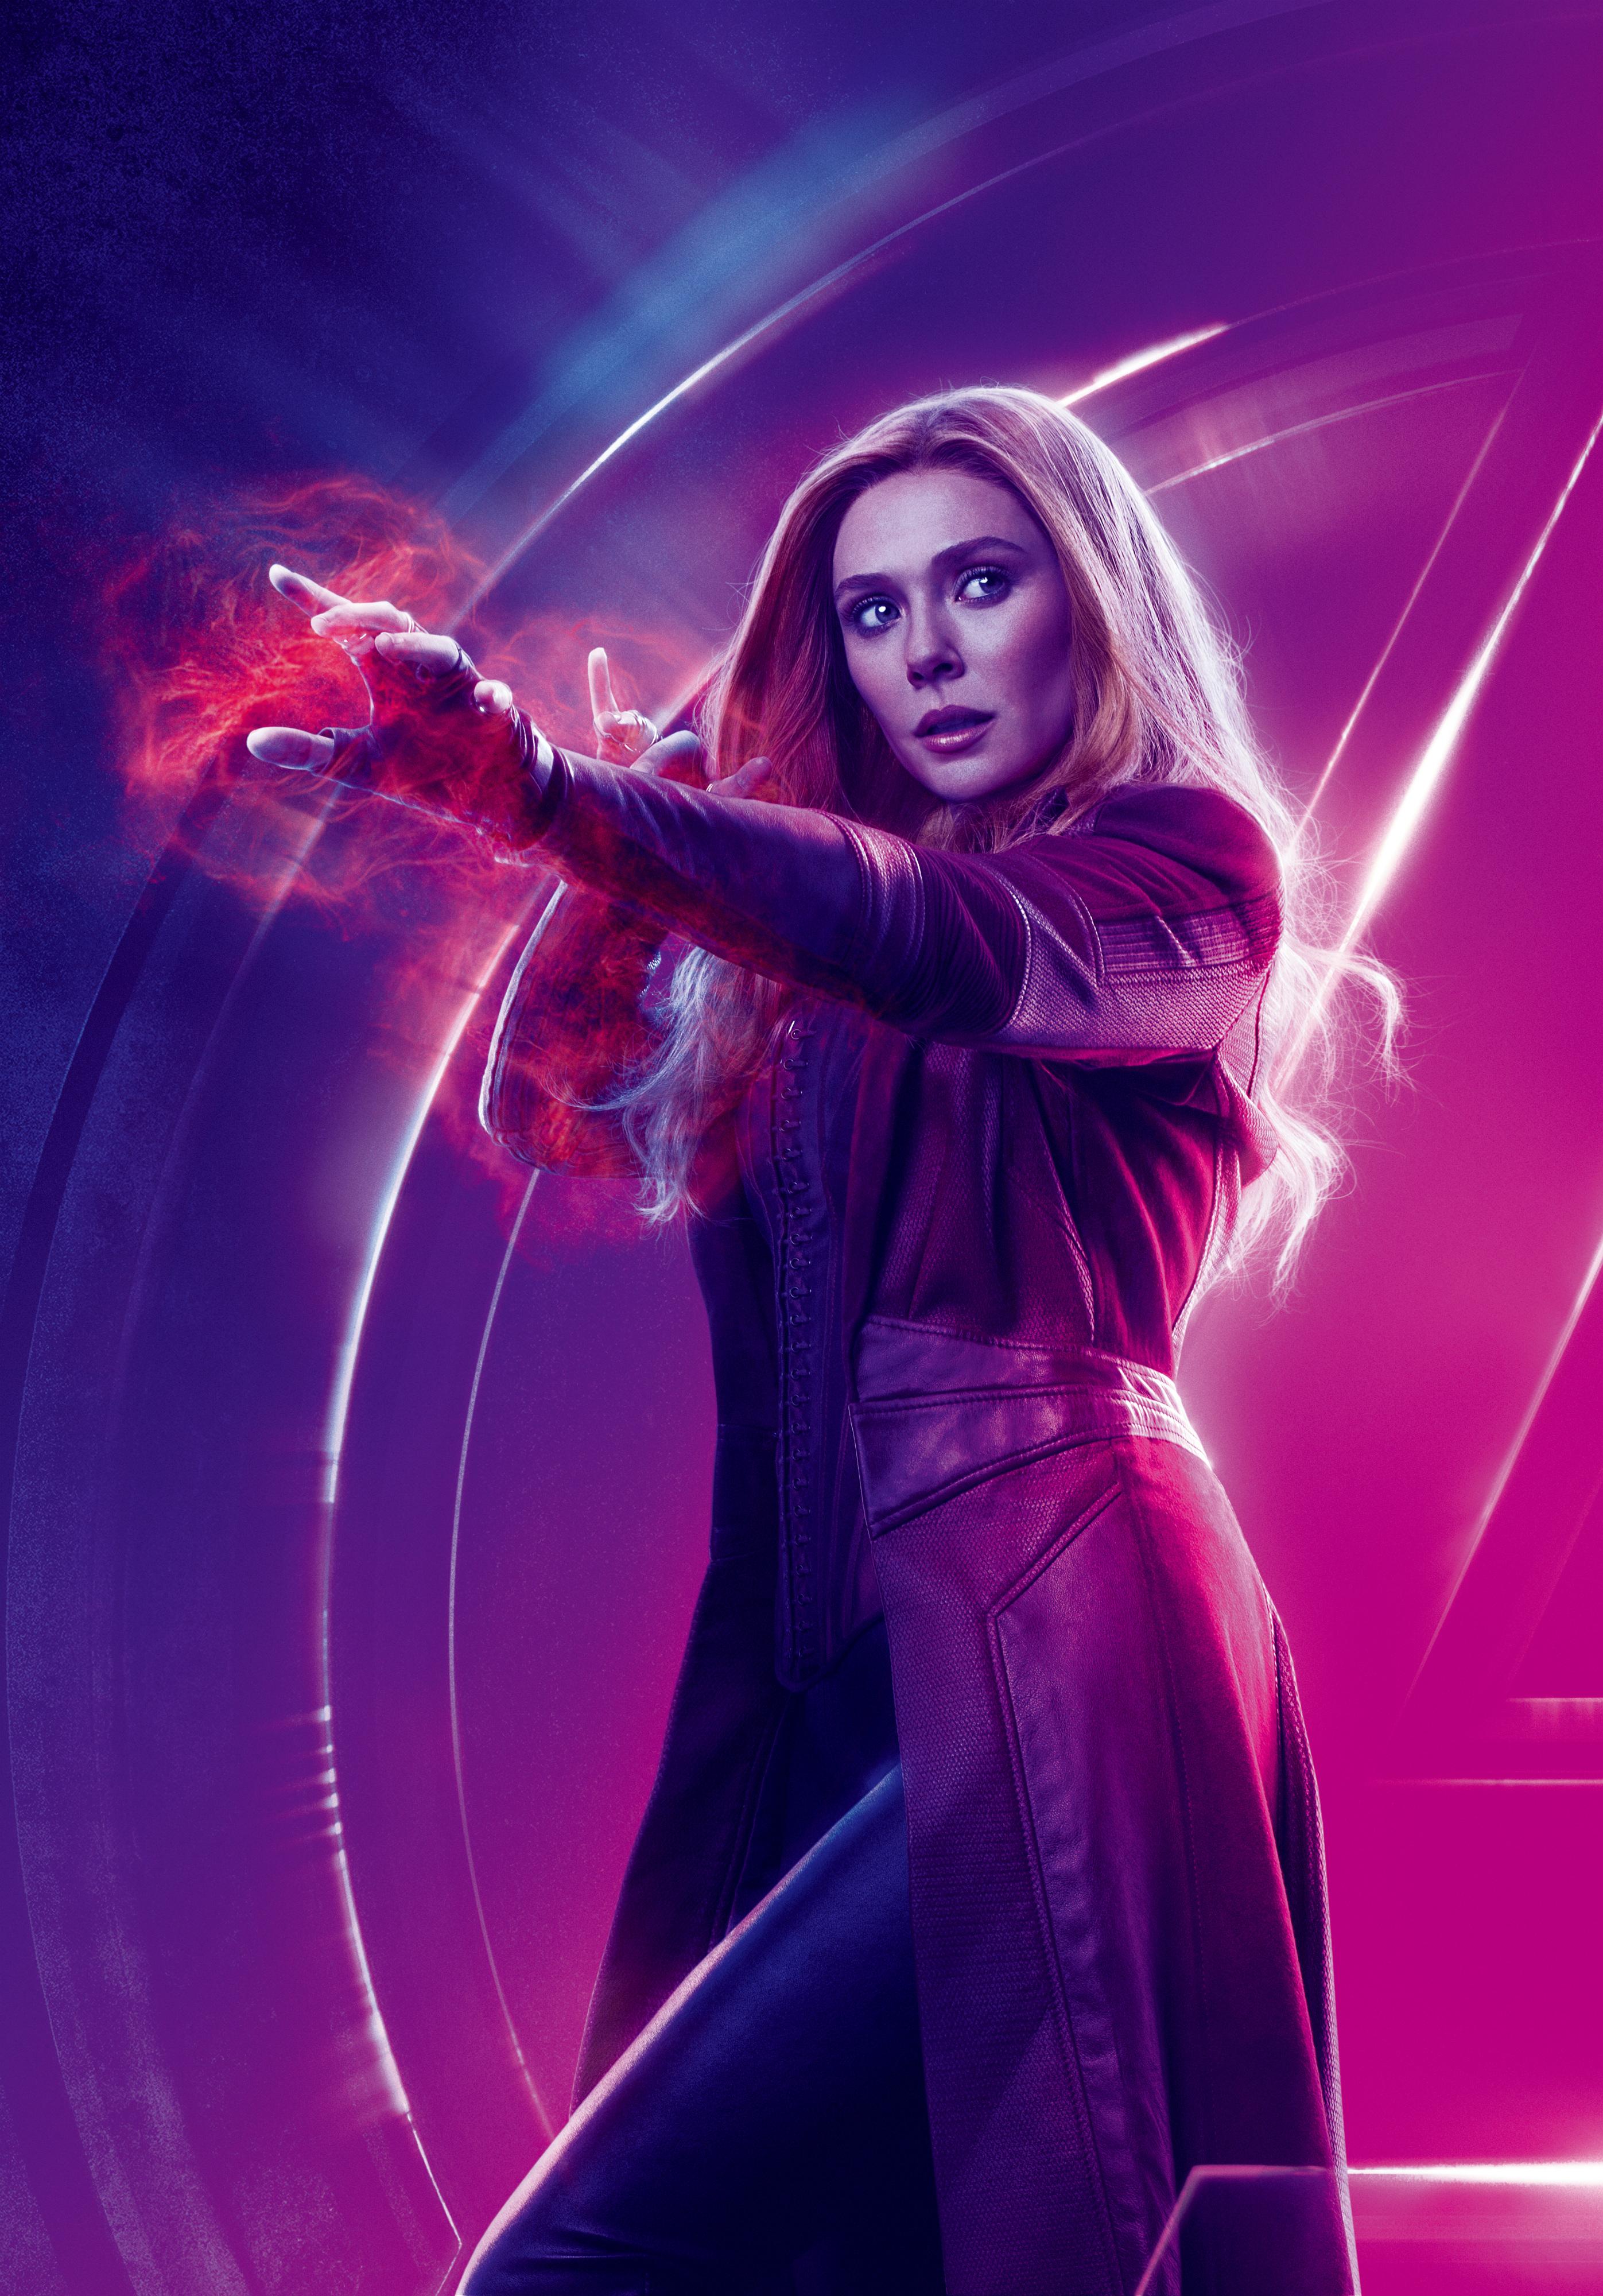 Wanda Maximoff (Marvel Cinematic Universe)